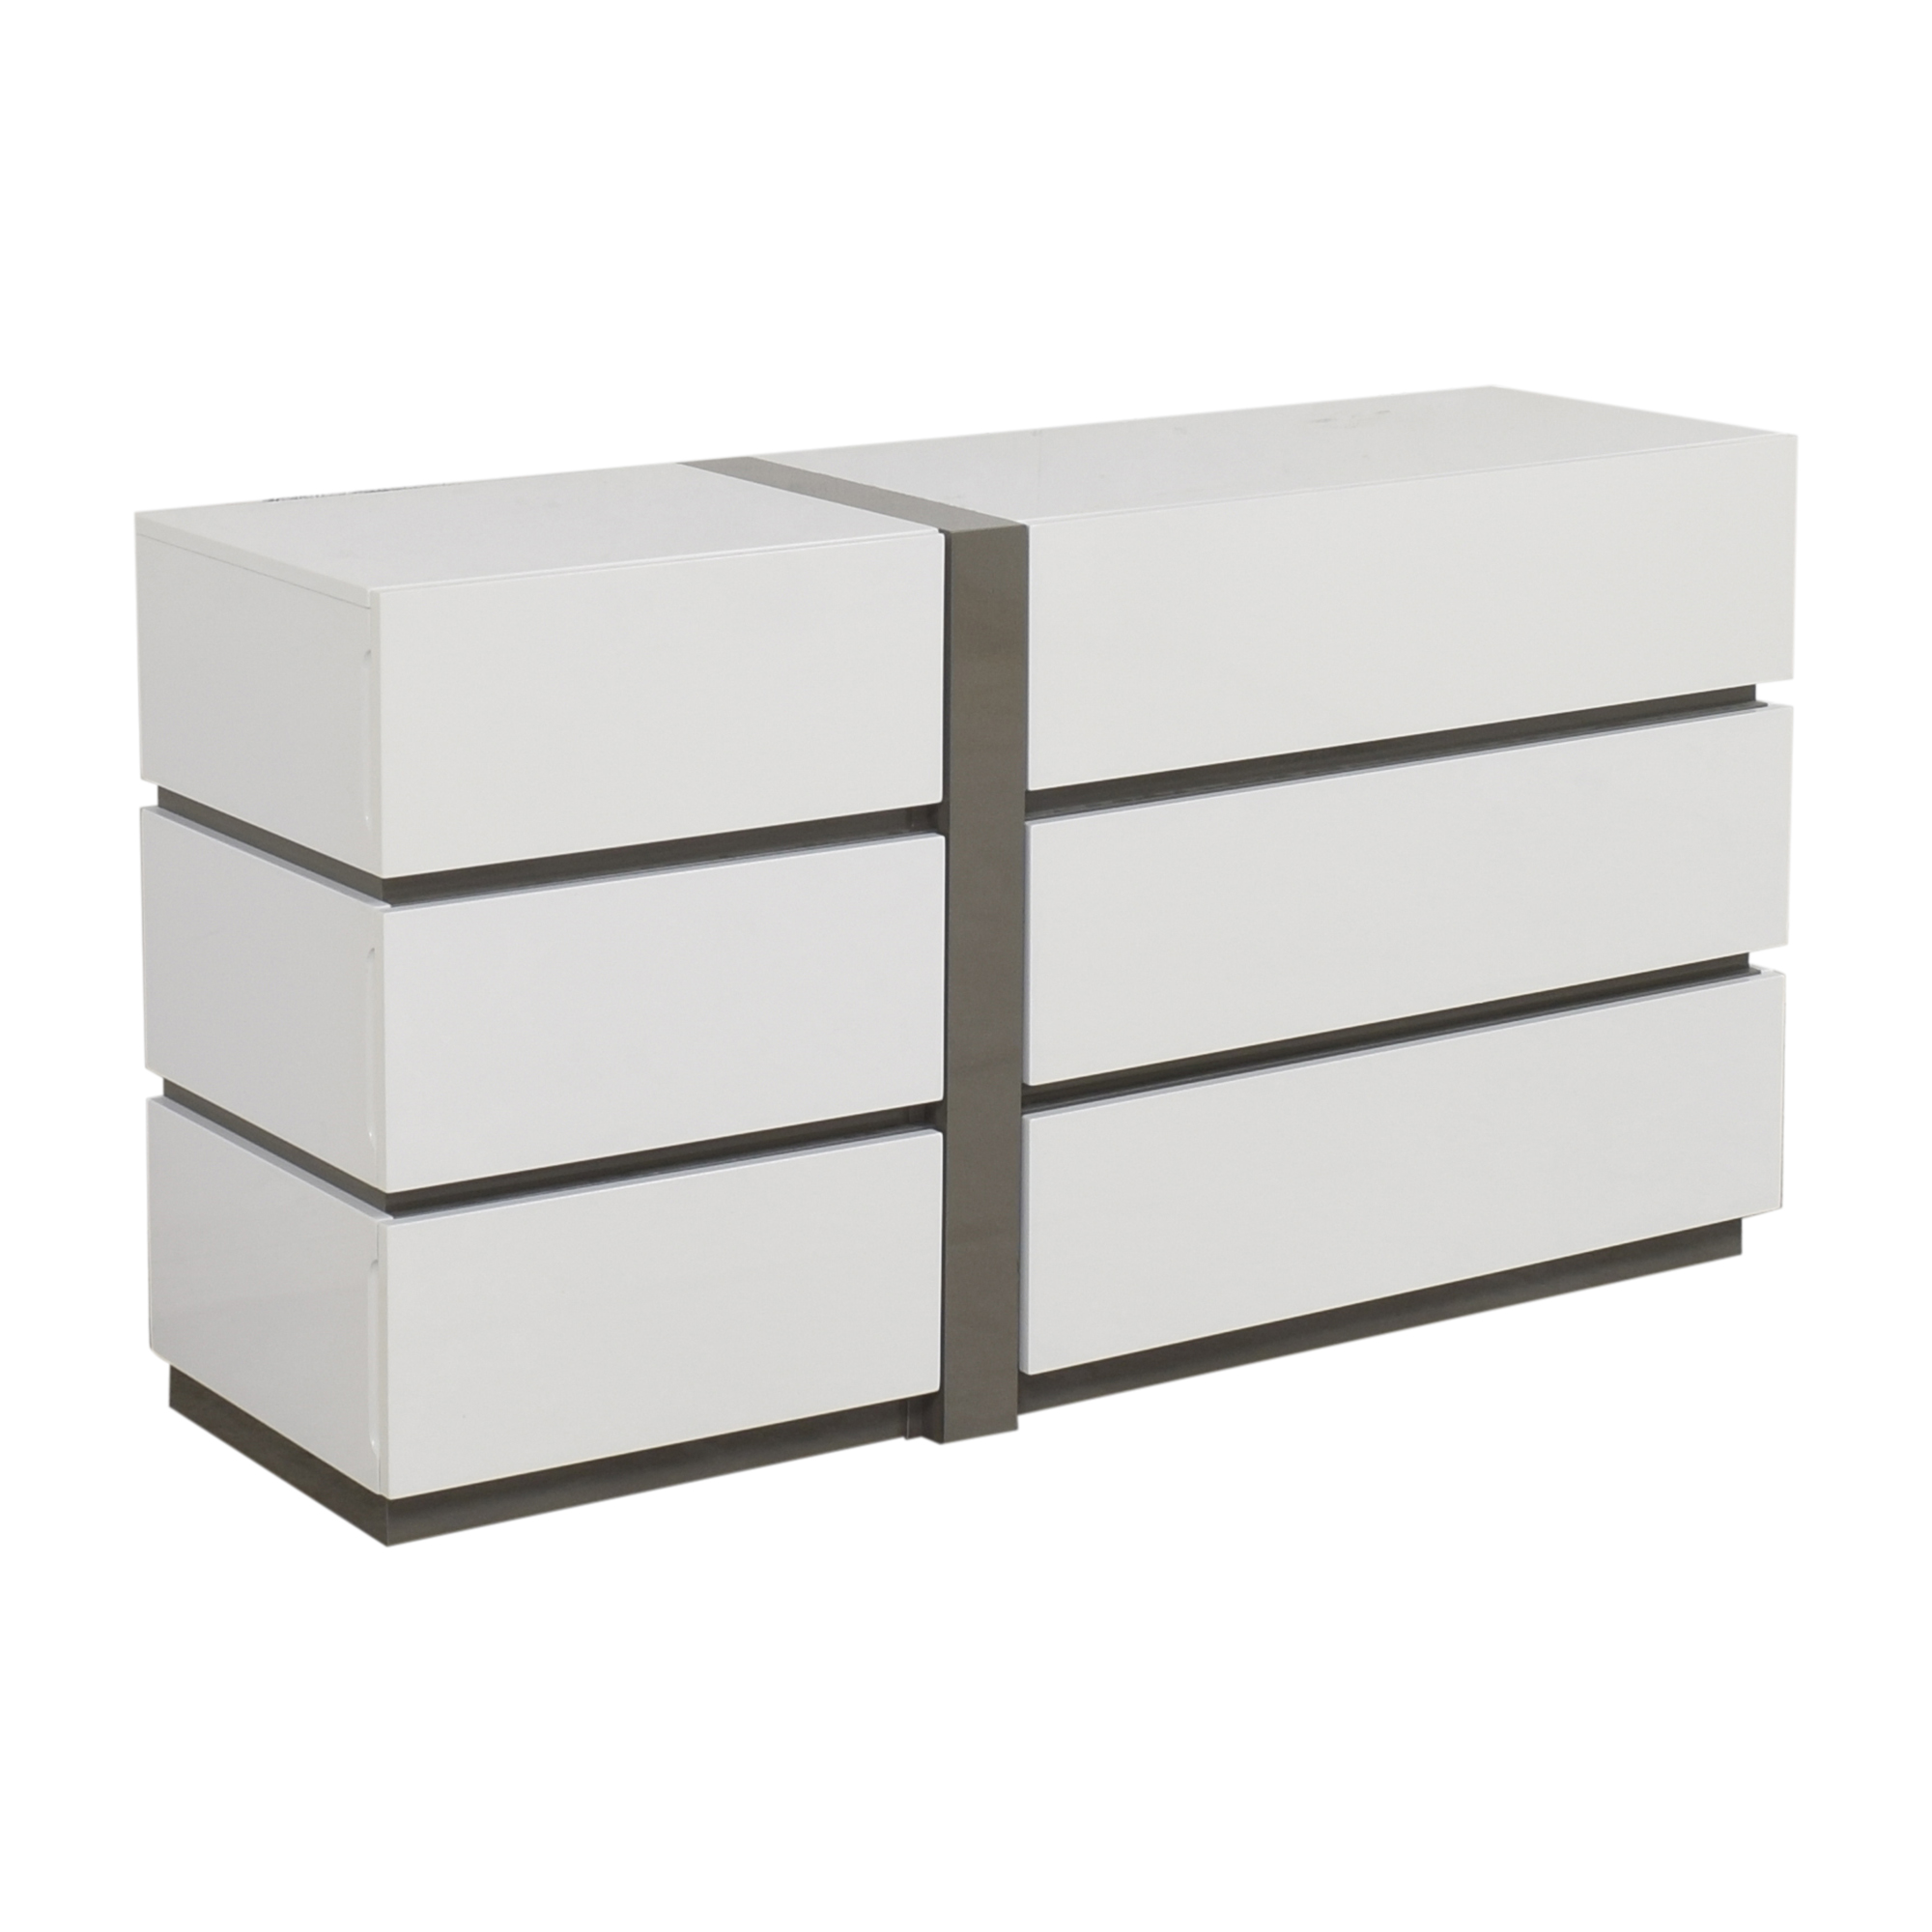 buy Chintaly Imports Manila Six Drawer Dresser Chintaly Imports Dressers